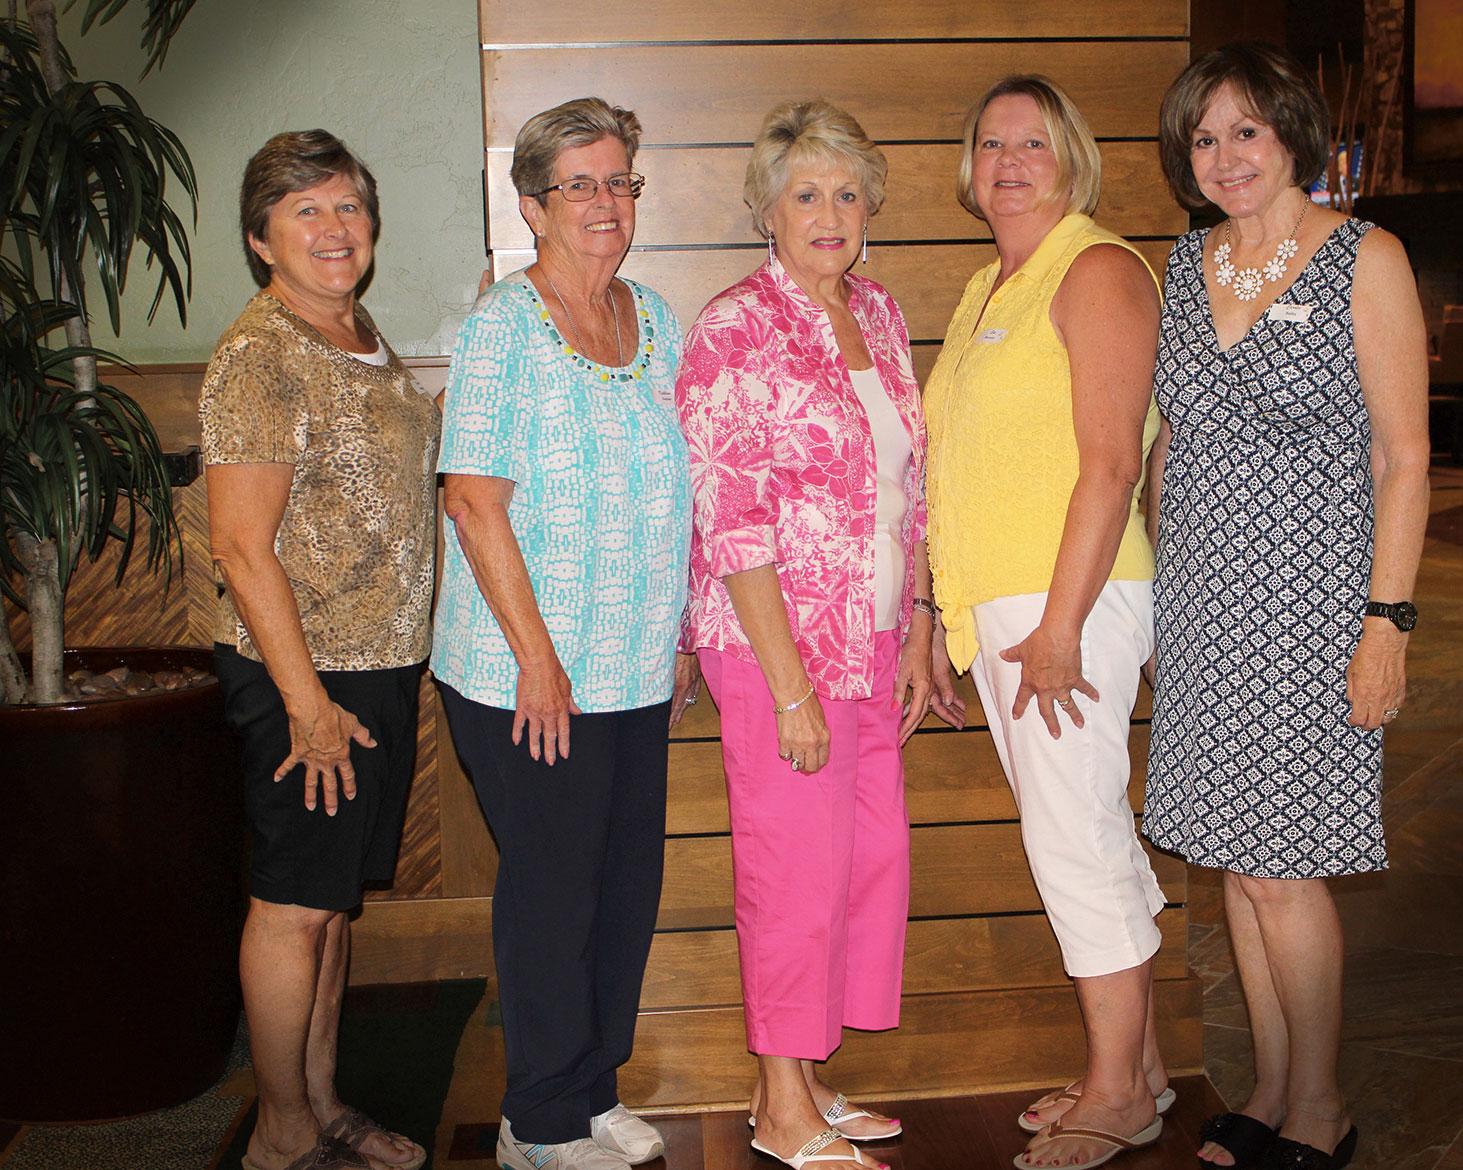 New members of the SBR Women's Club, left to right: Karen Malek, Kathy Nedder, Irene Keil, Sue Monson and Carolee Bailey